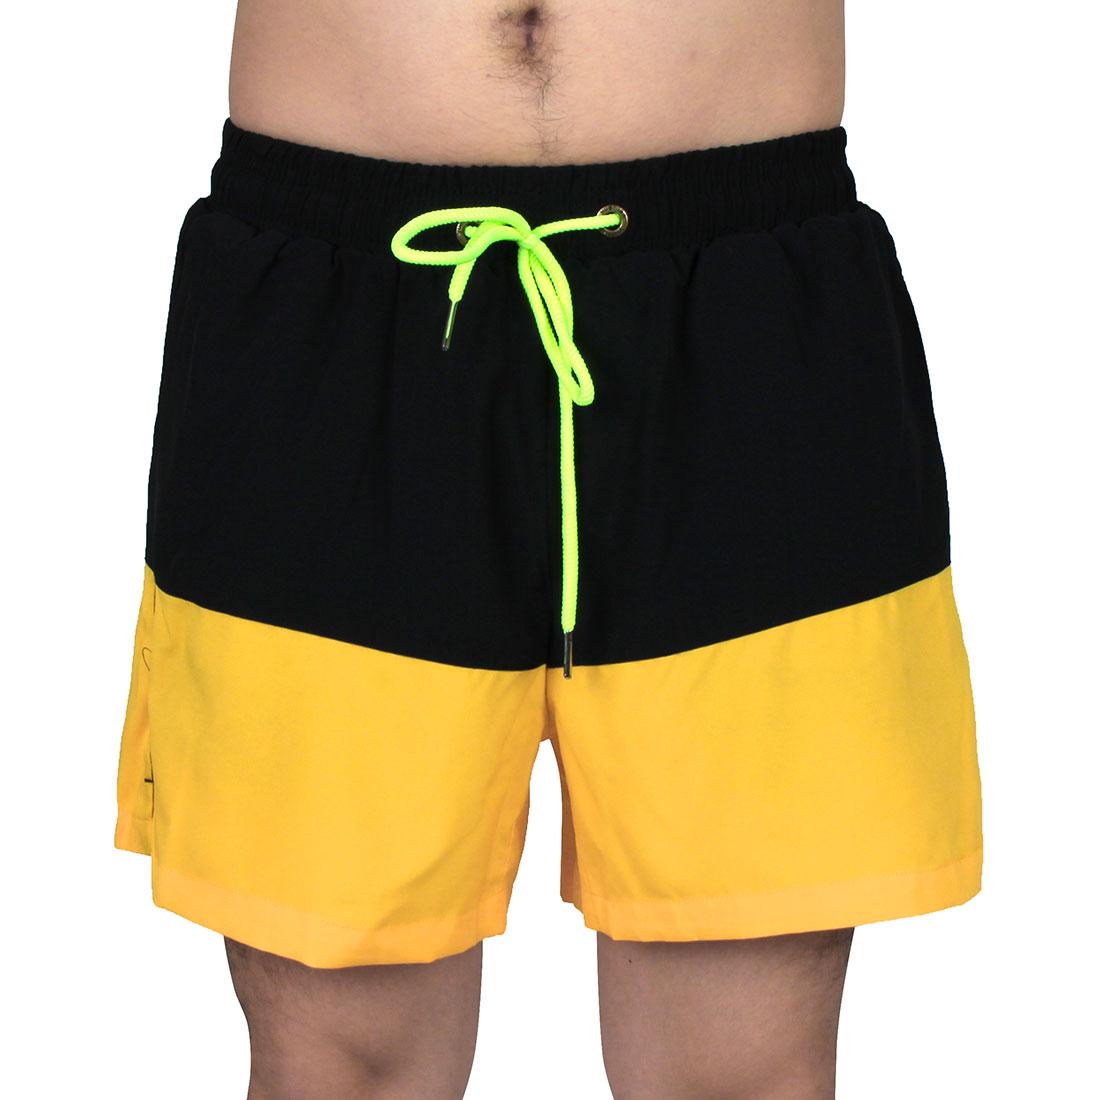 Men Sports Running Polyester Summer Beach Surf Board Shorts Pants Yellow W32